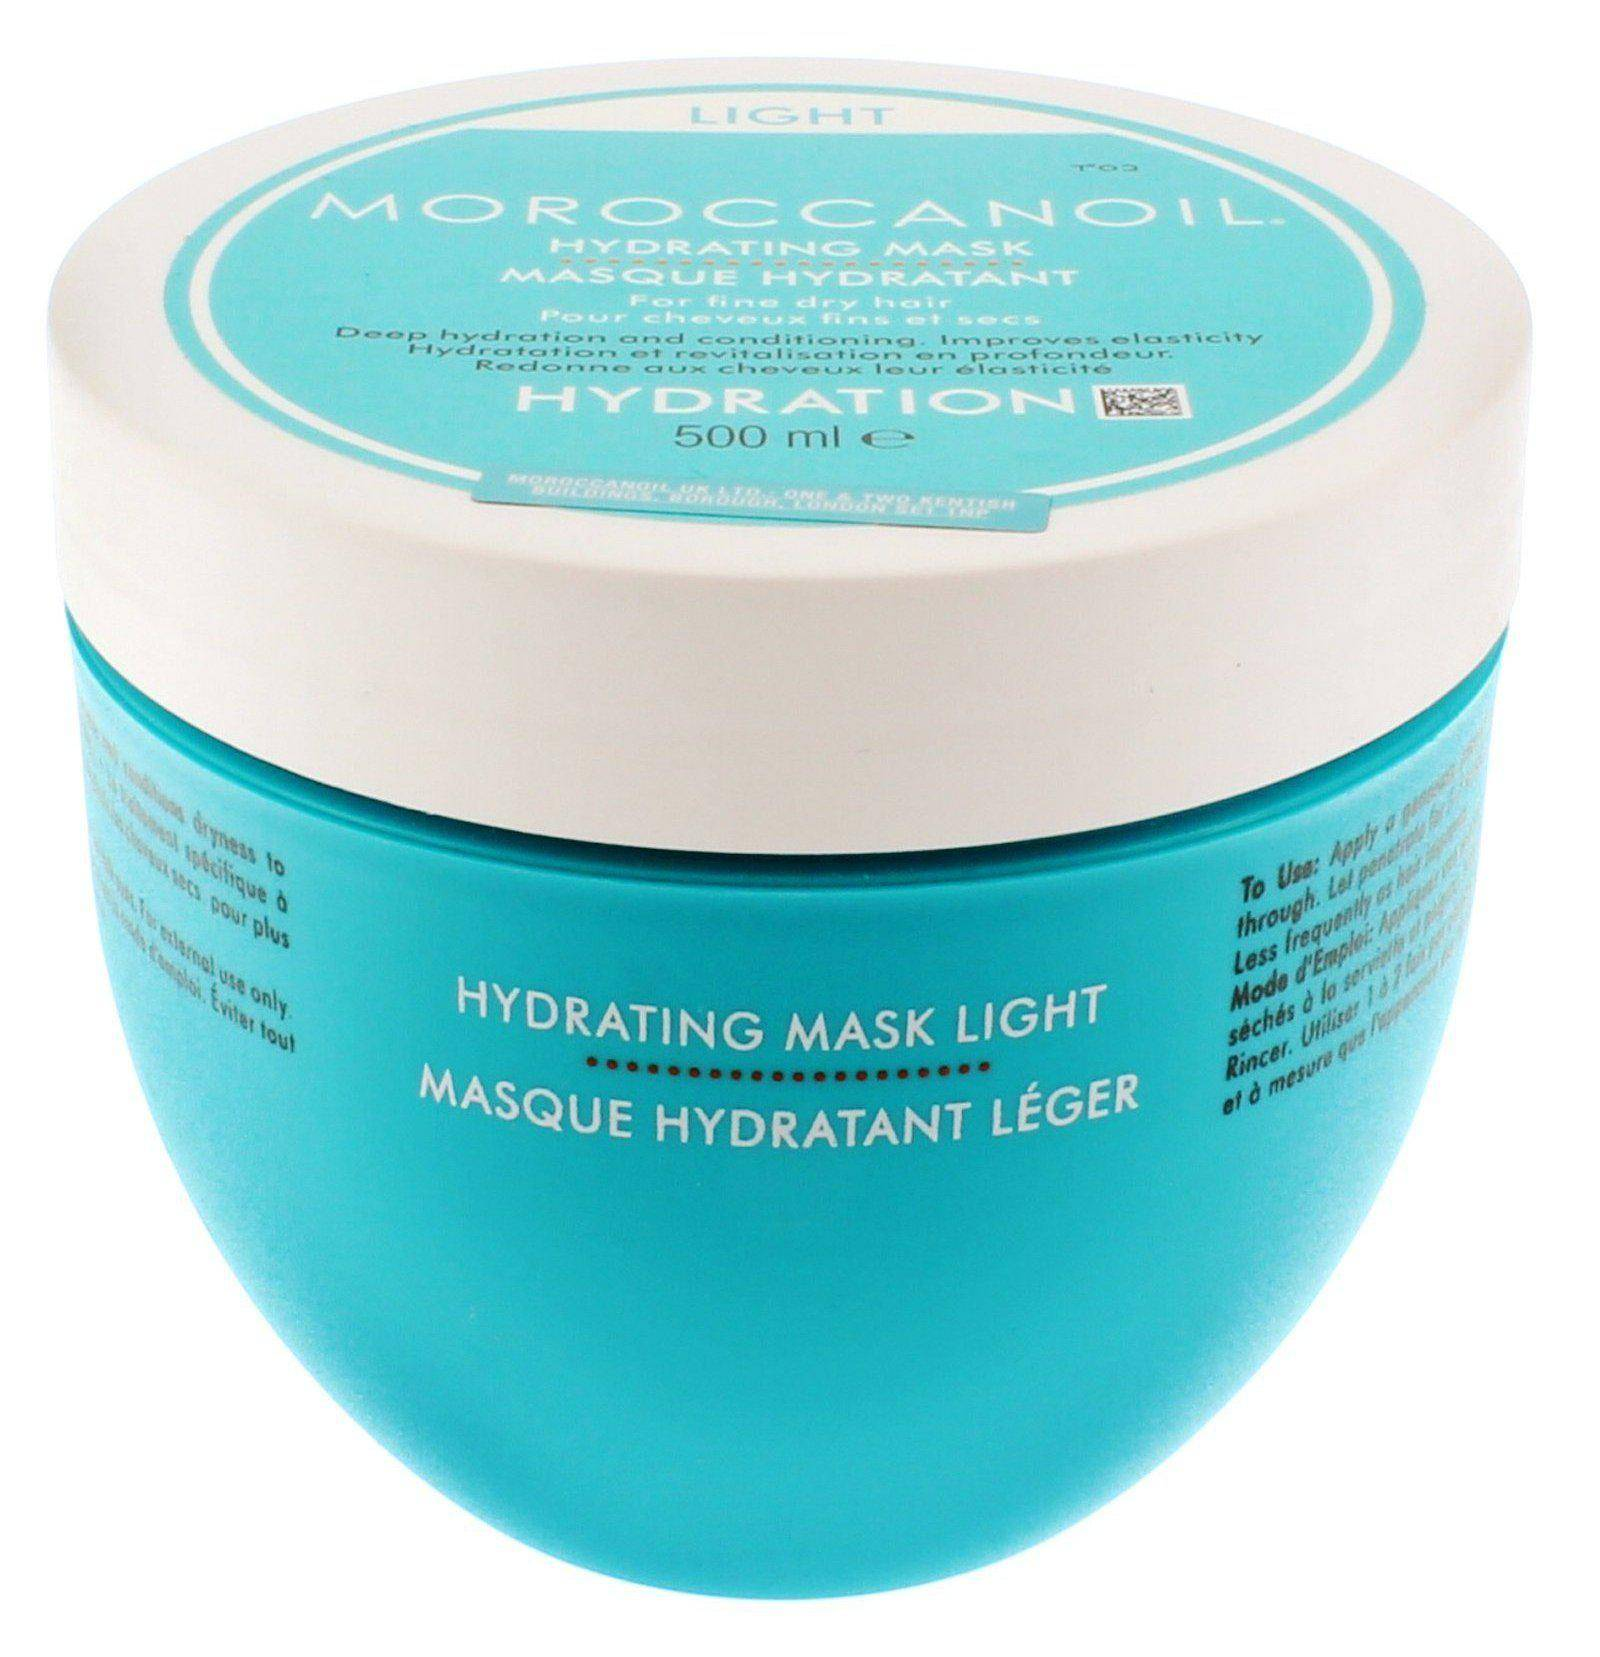 Moroccanoil Light Hydrating Mask 500ml